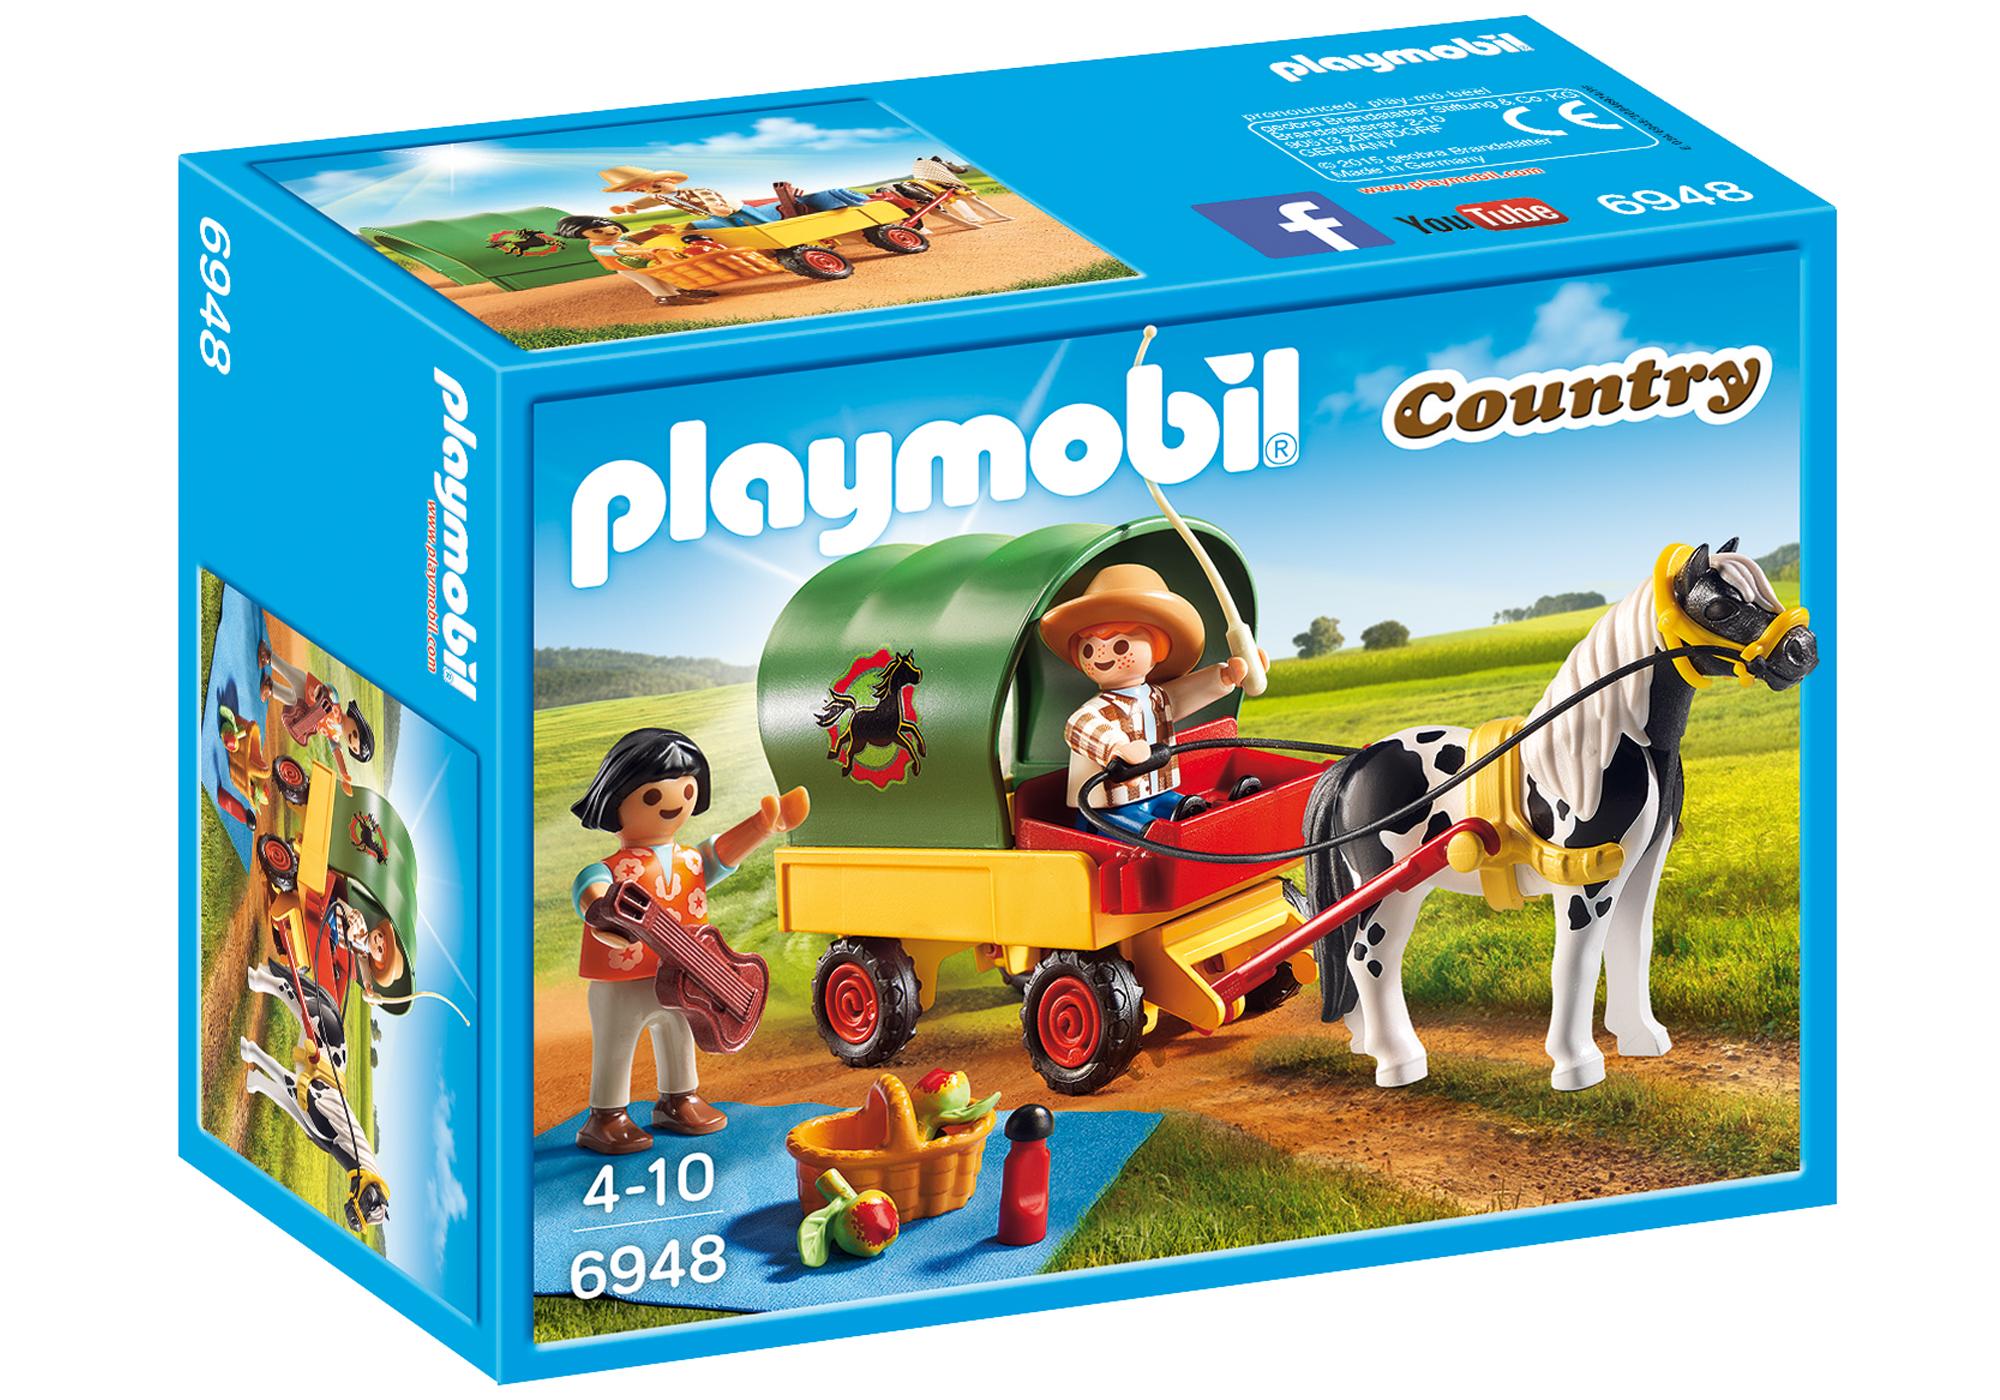 http://media.playmobil.com/i/playmobil/6948_product_box_front/Picnic with Pony Wagon